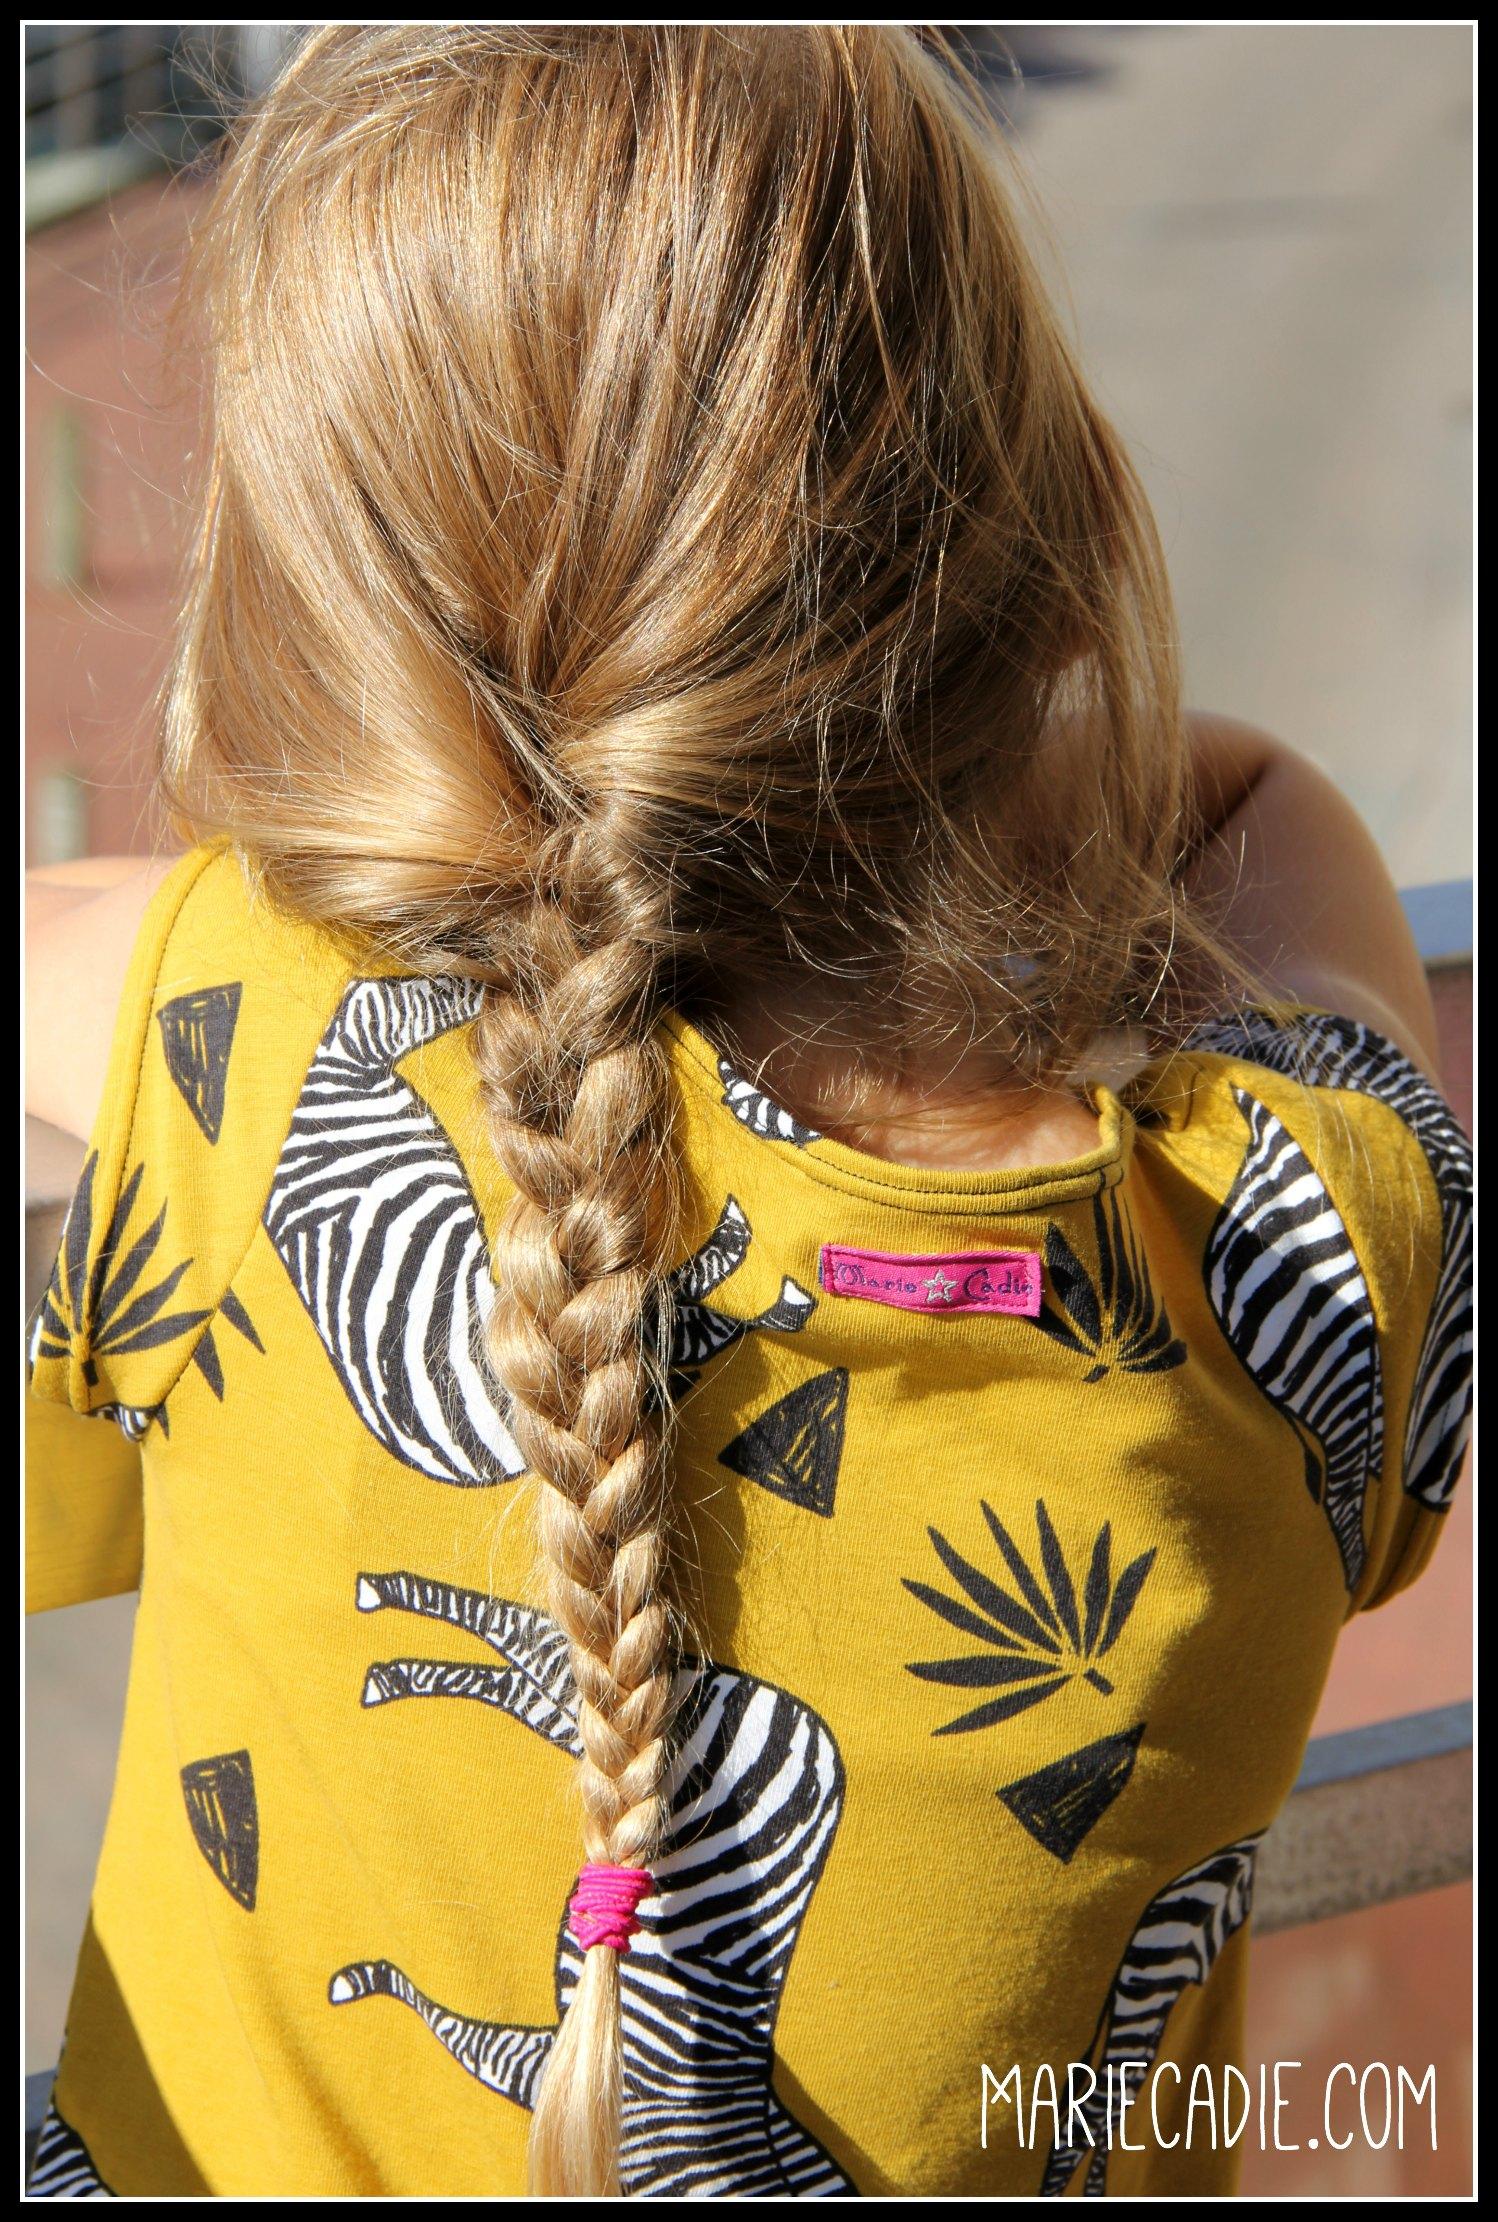 MarieCadie.com Candy Dress LMV_3